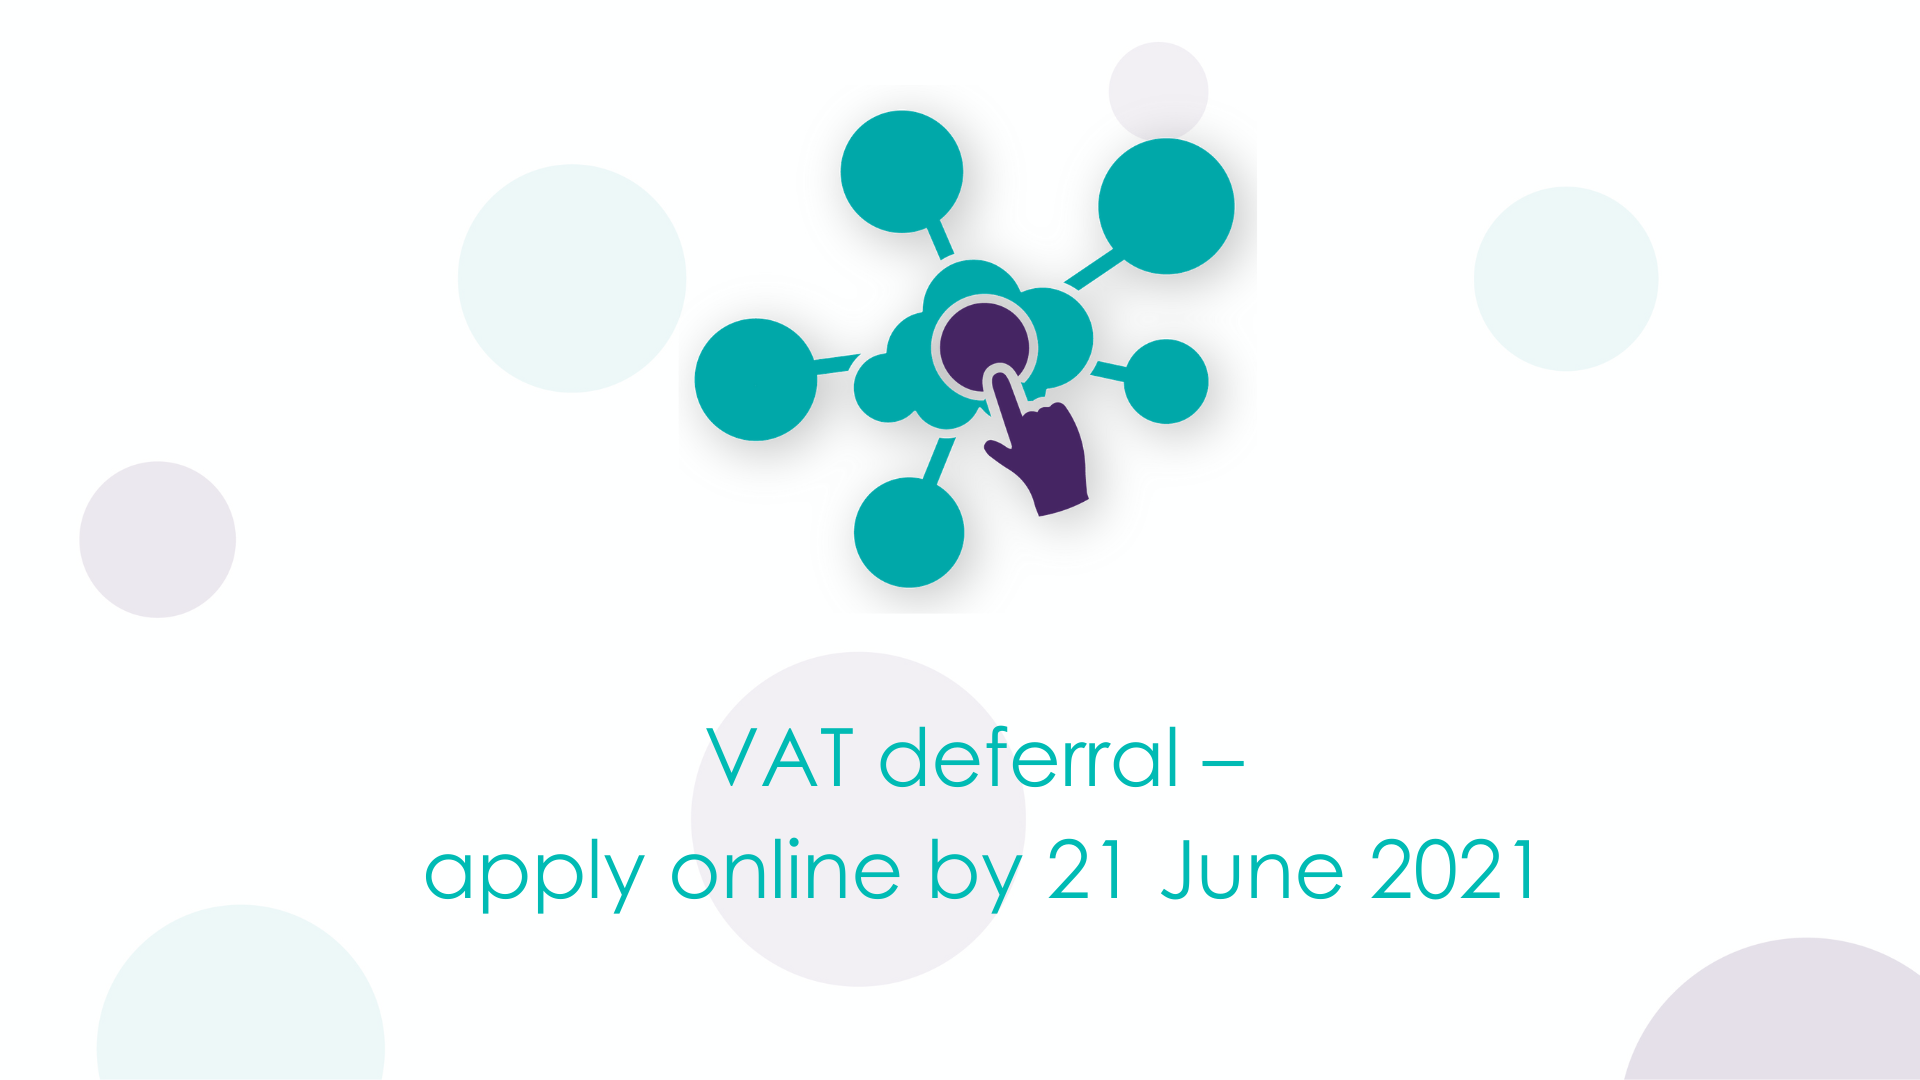 VAT deferral – apply online by 21 June 2021